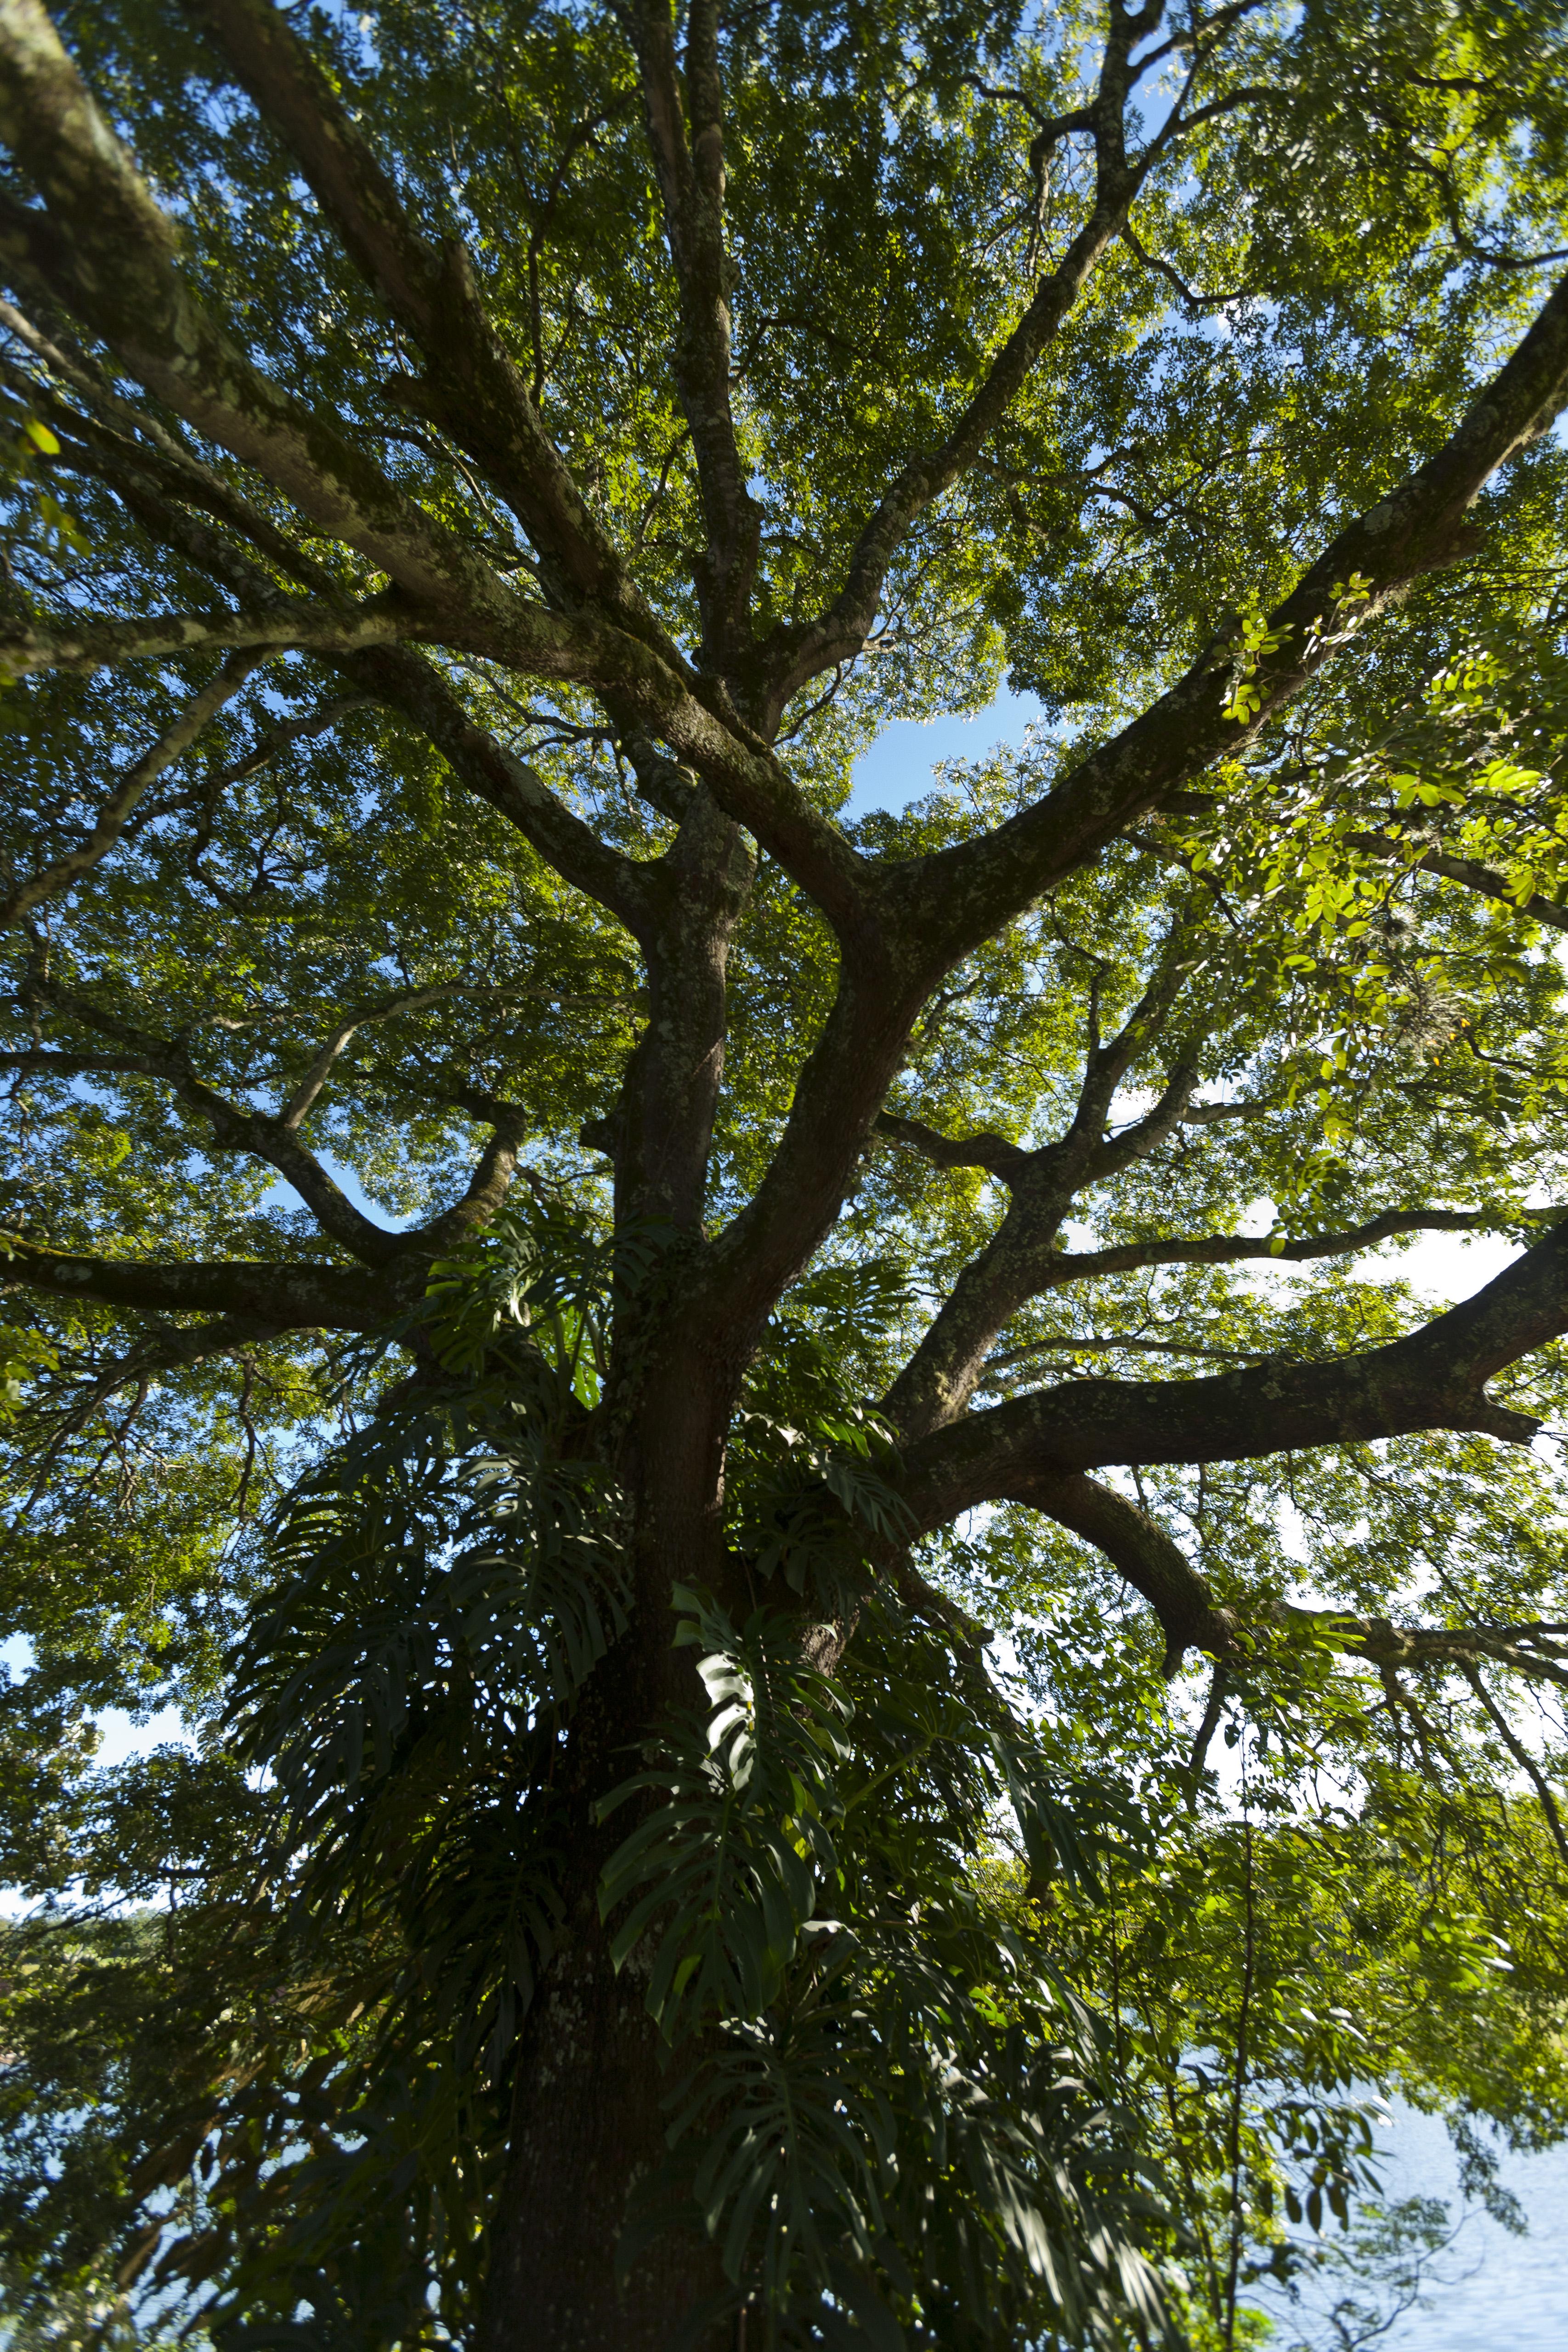 File:Copaiba tree vertical.jpg - Wikimedia Commons